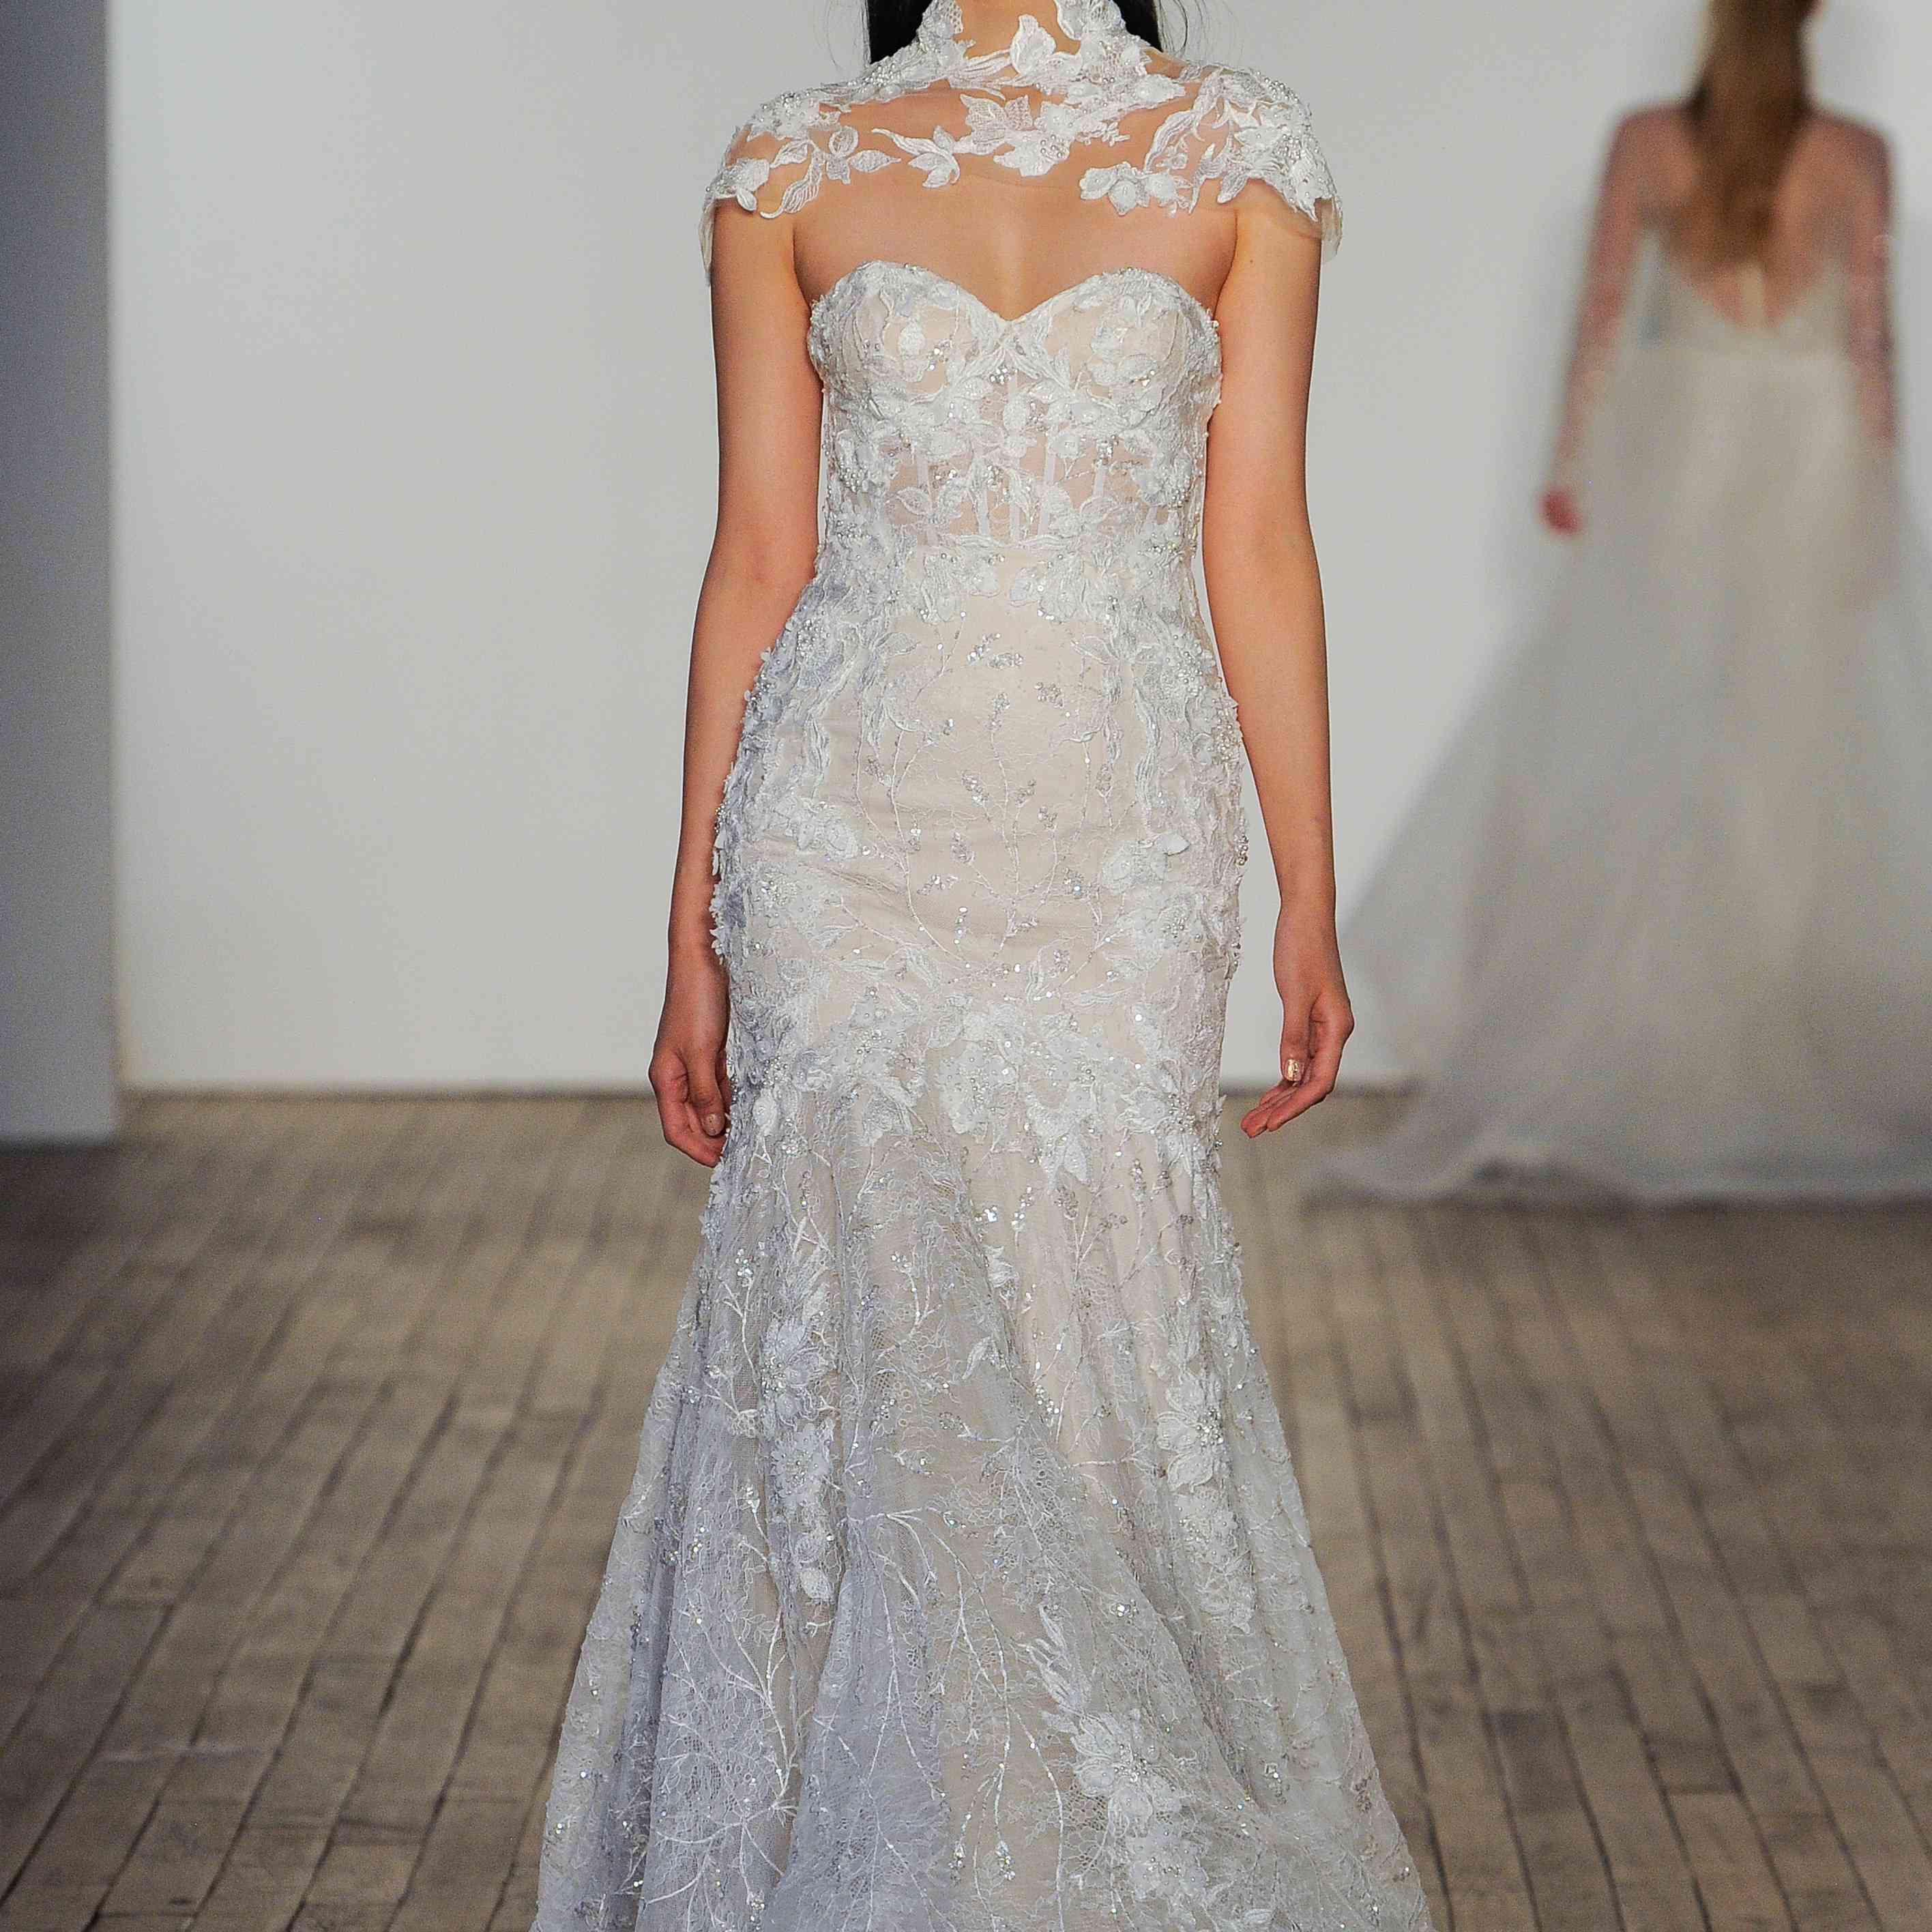 Allison Webb Wedding Dress